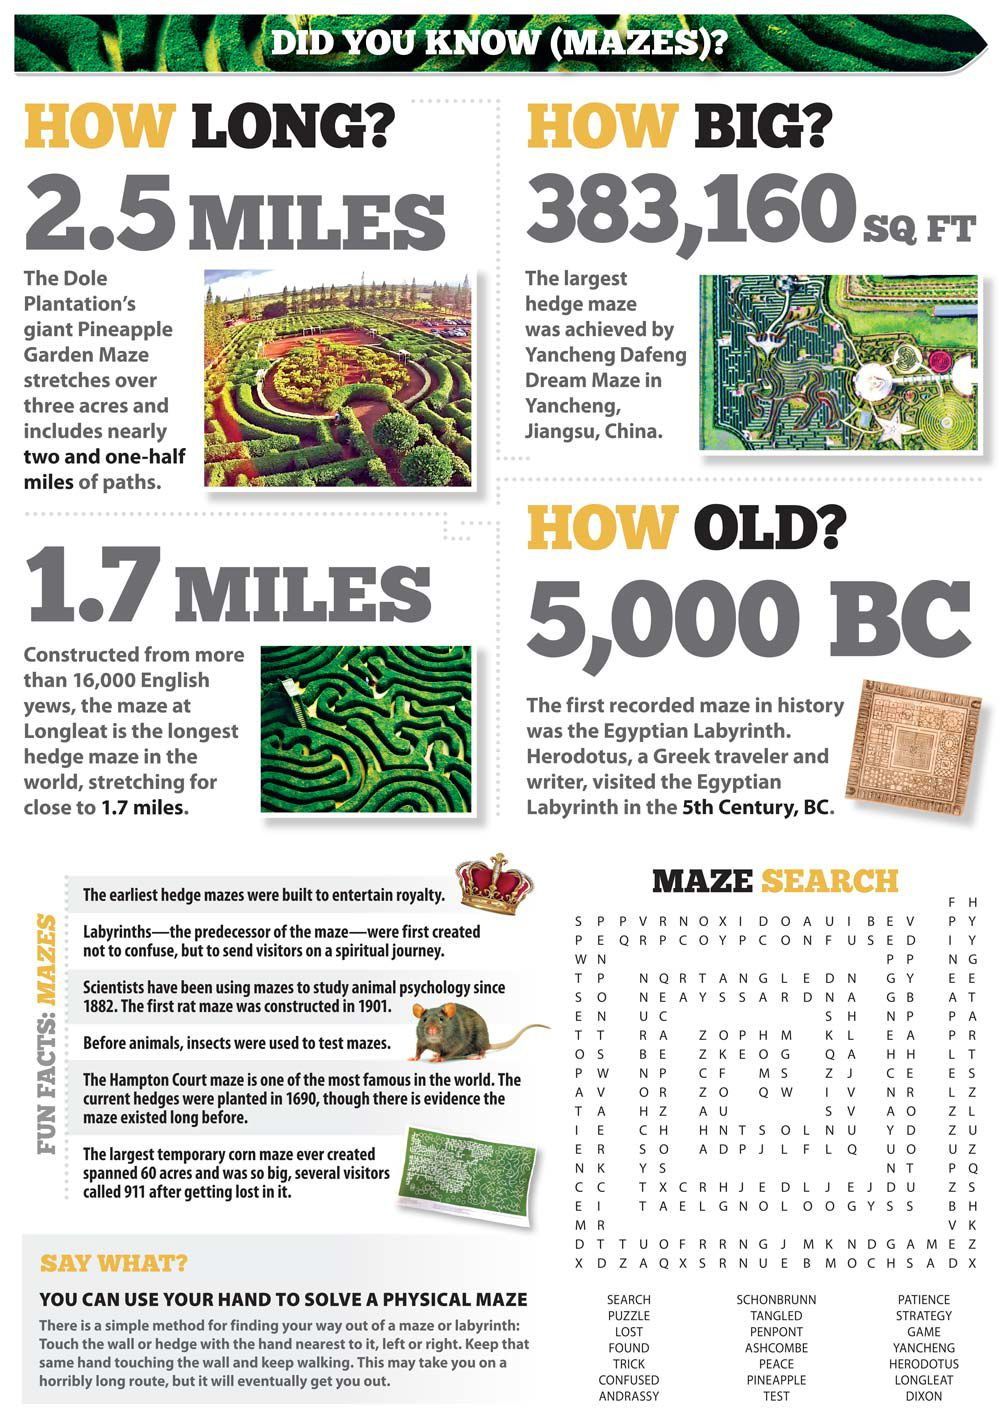 Did you know? Mazes | News & Stories | arcadianews com